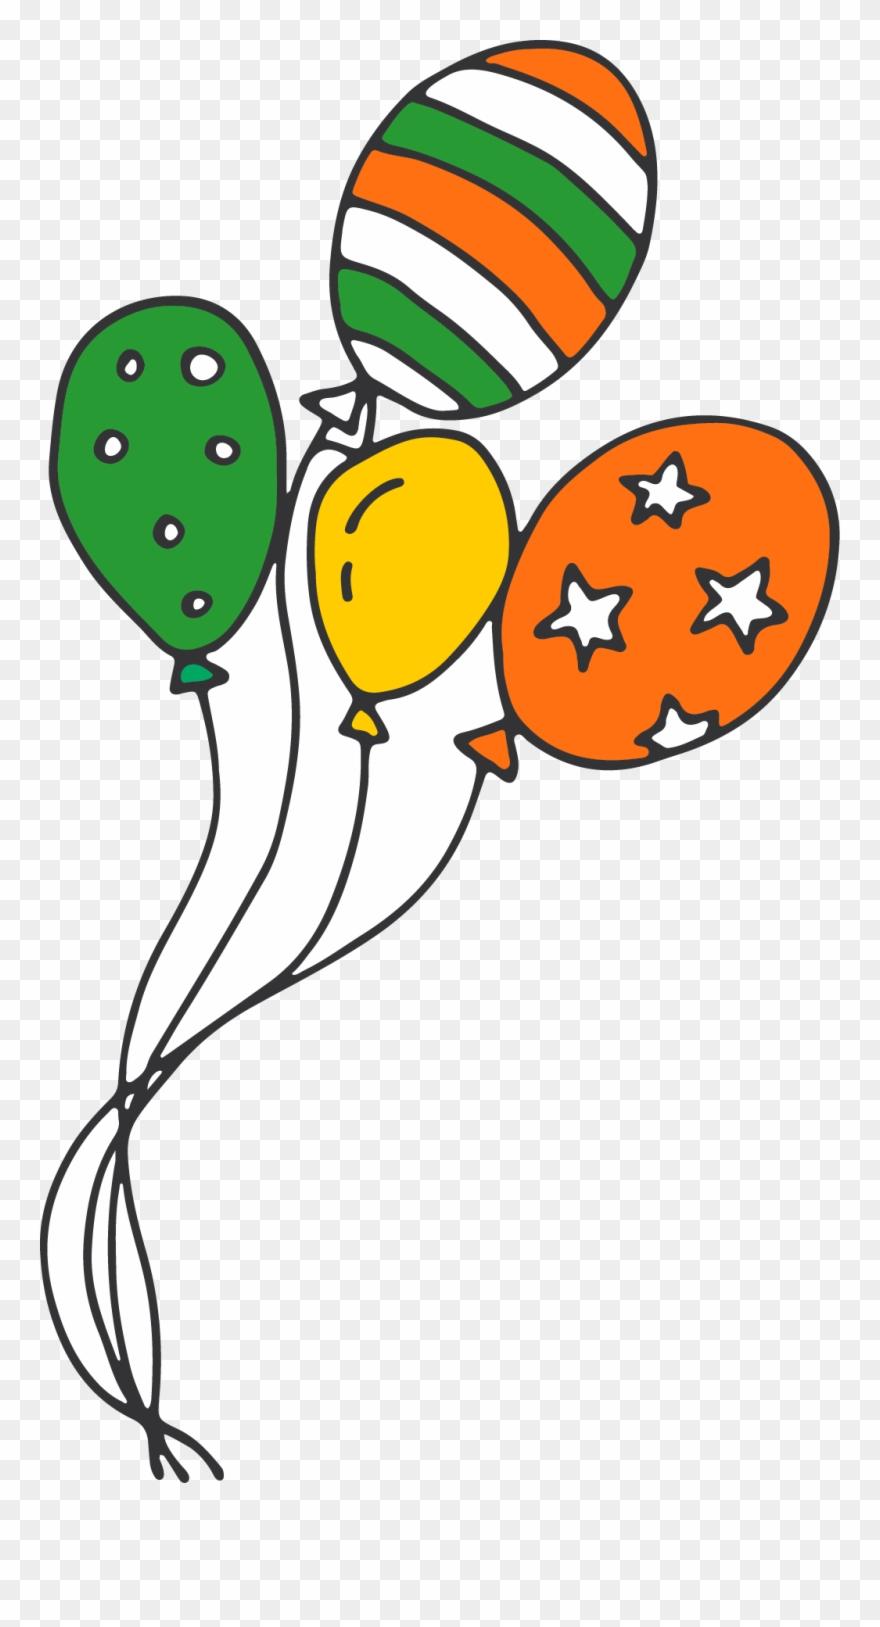 medium resolution of irish party balloons clipart